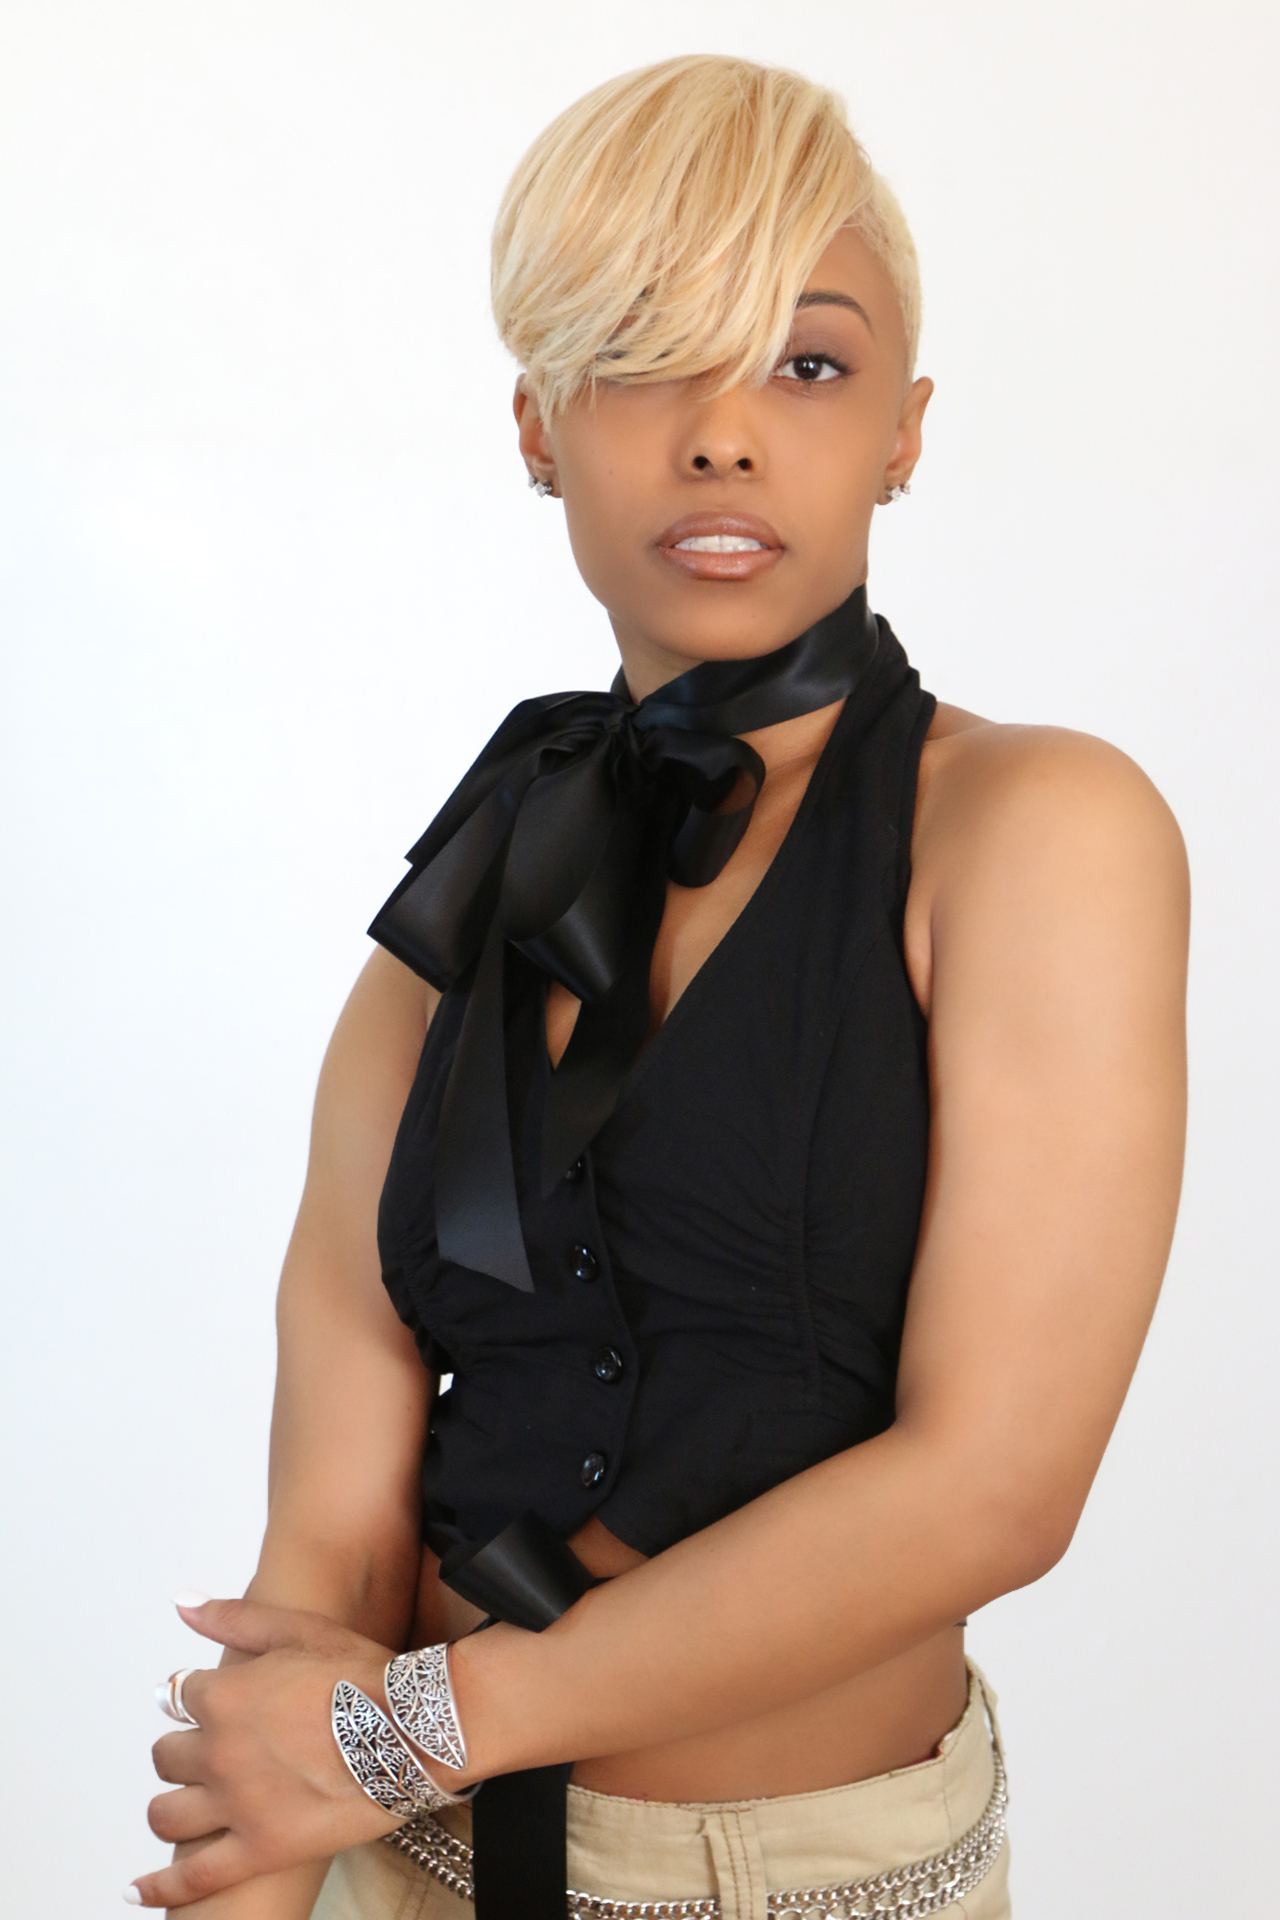 Zuleka Diamond - Credits:Alvin Ailey Arts & Ed, Beyoncé, Diddy & So You Think You Can Dance@zulekadiamond